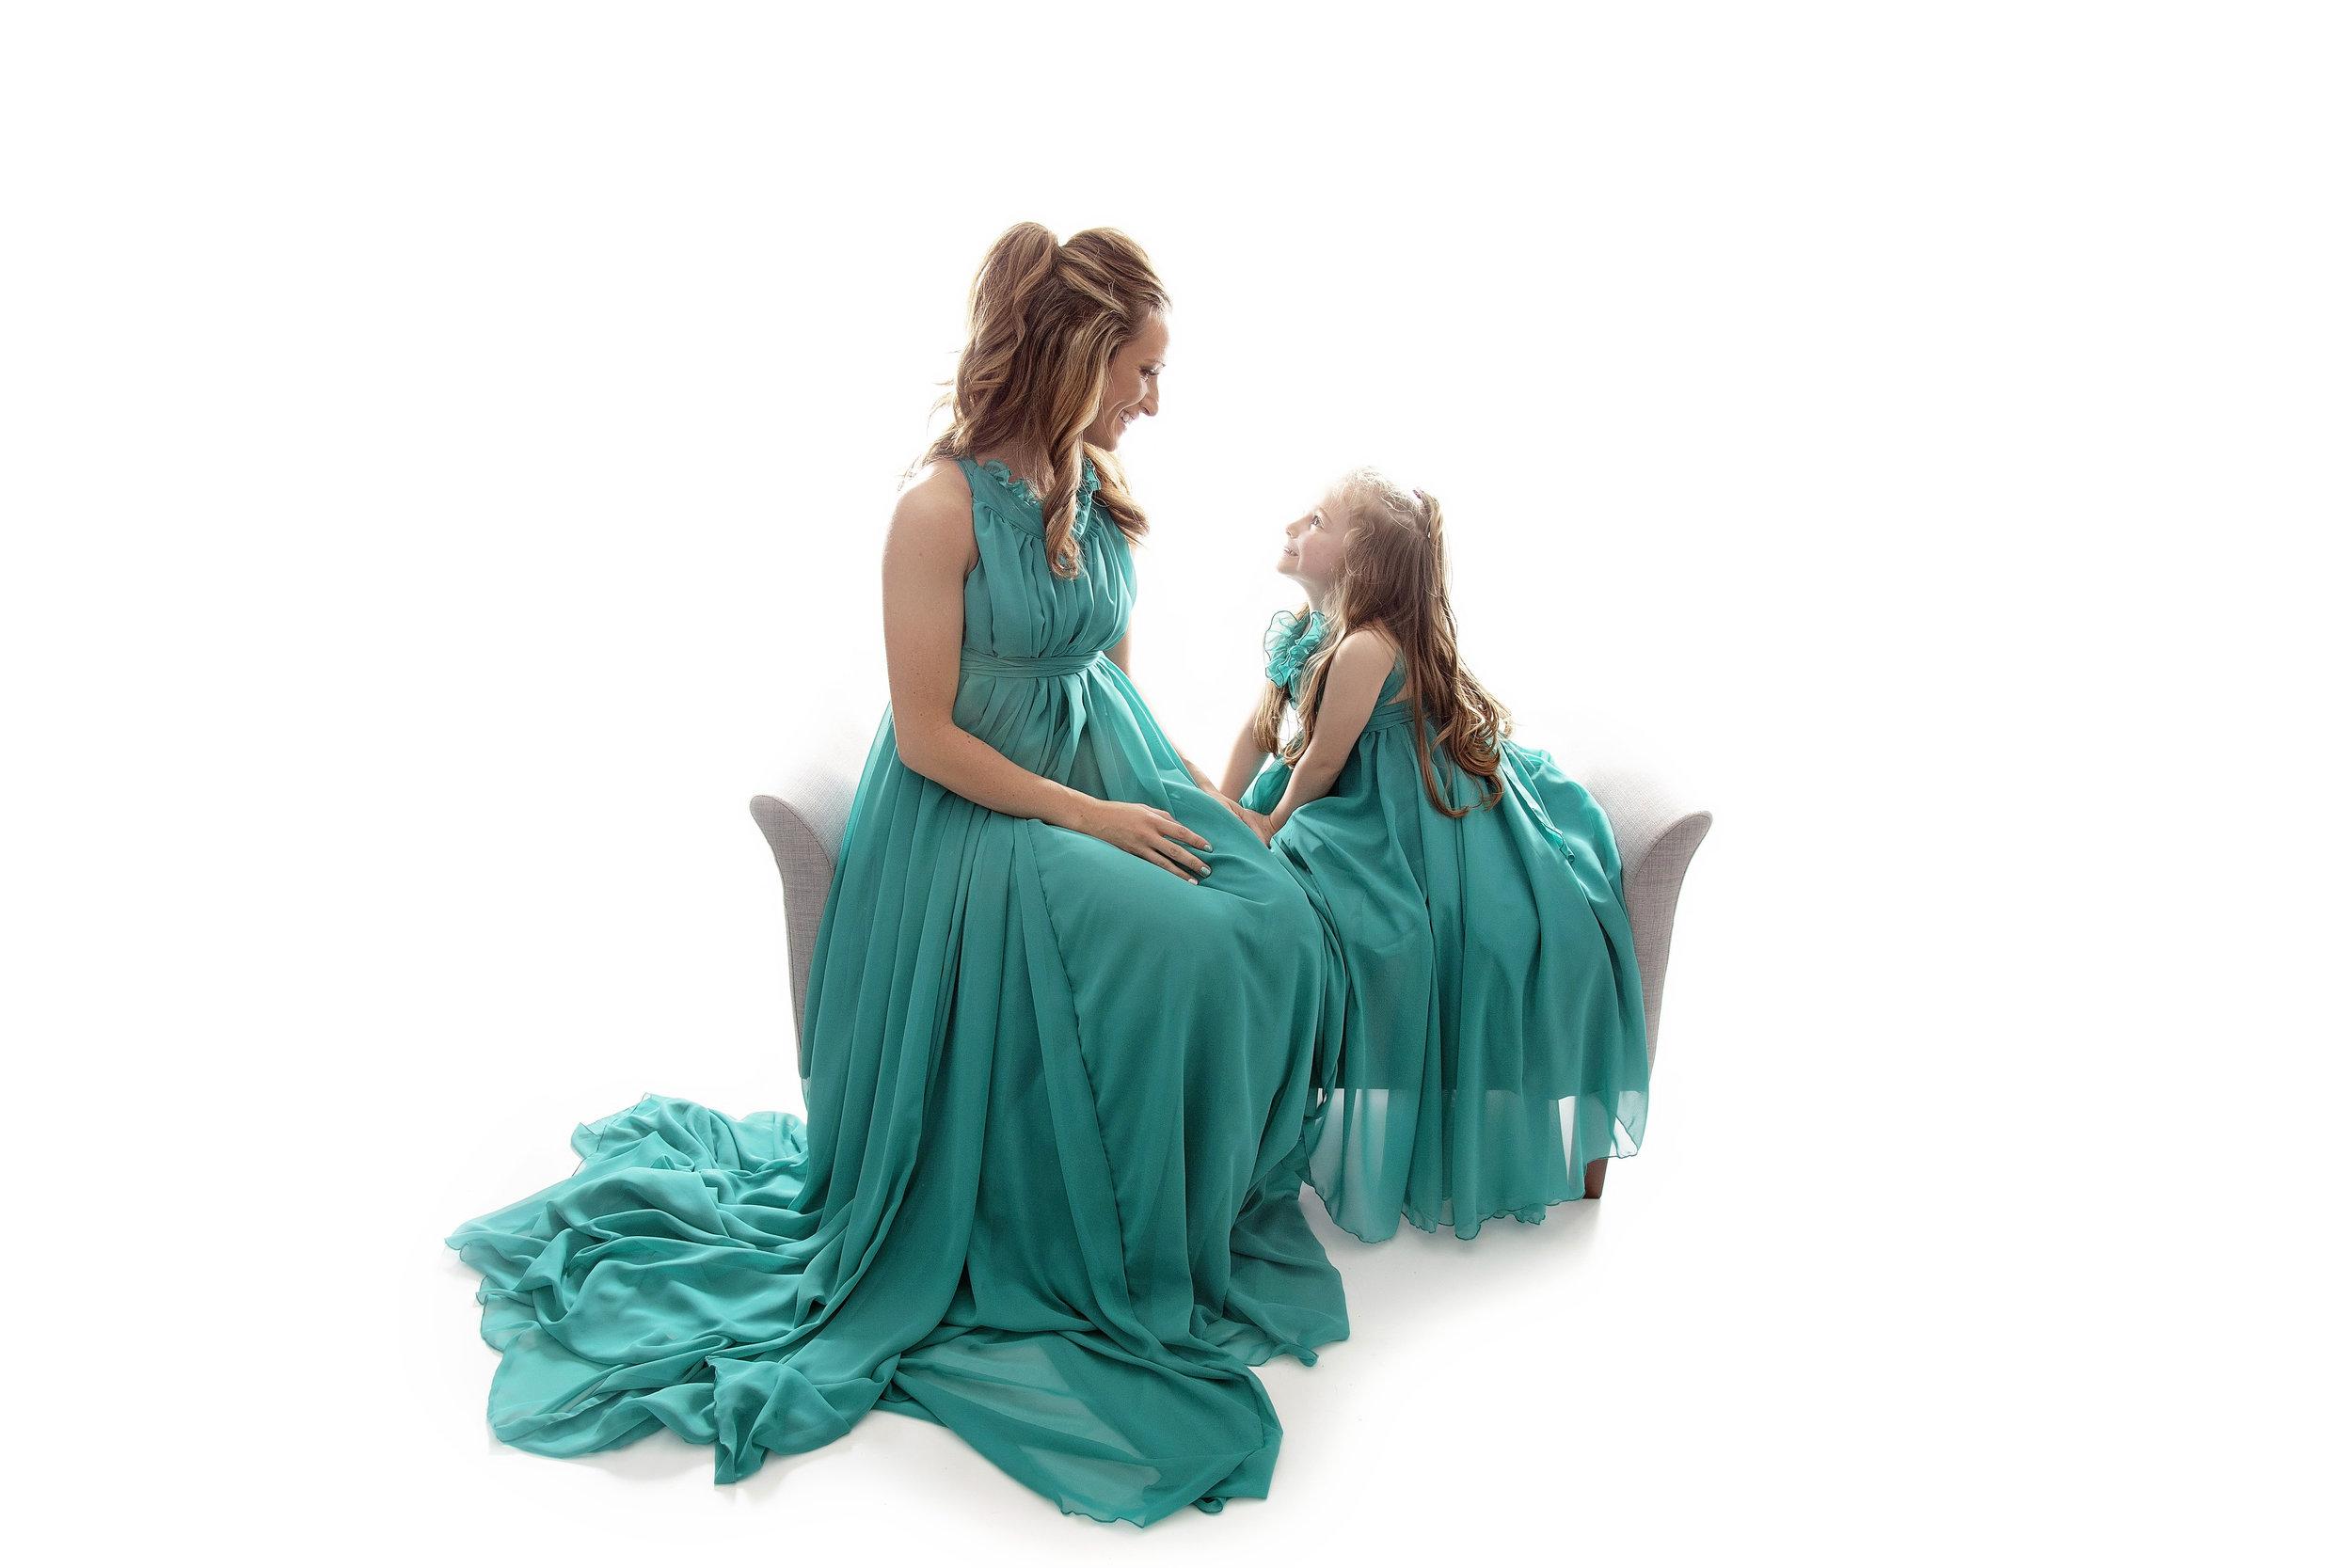 Lisa_Mommy_and_Me_AEP_004.jpg